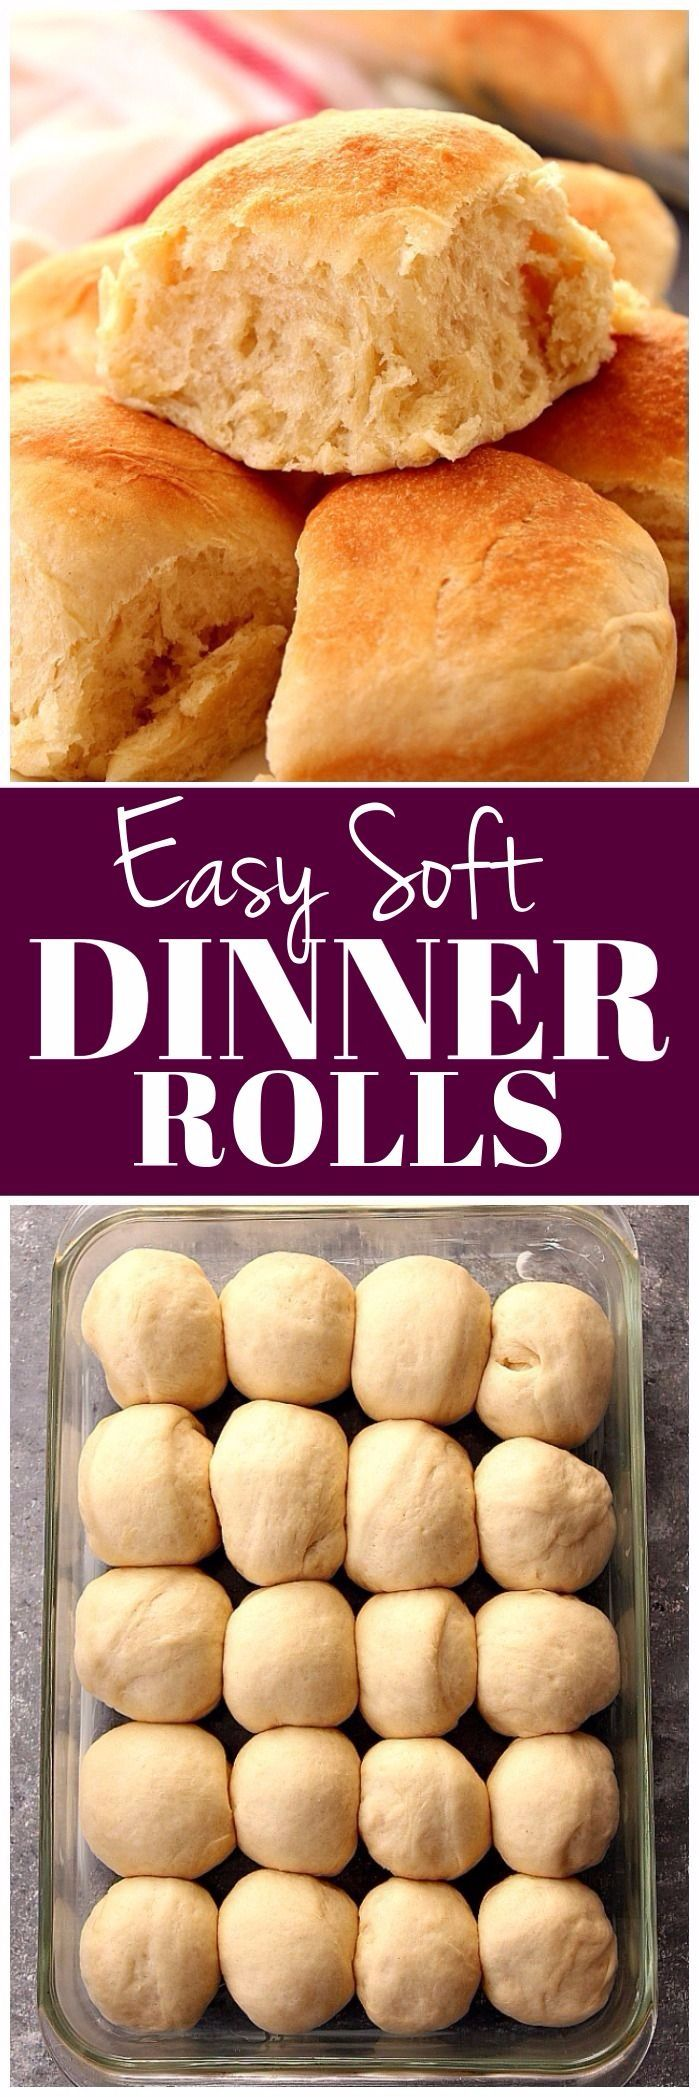 The Best Easy Dinner Rolls Recipe | www.crunchycreamysweet.com